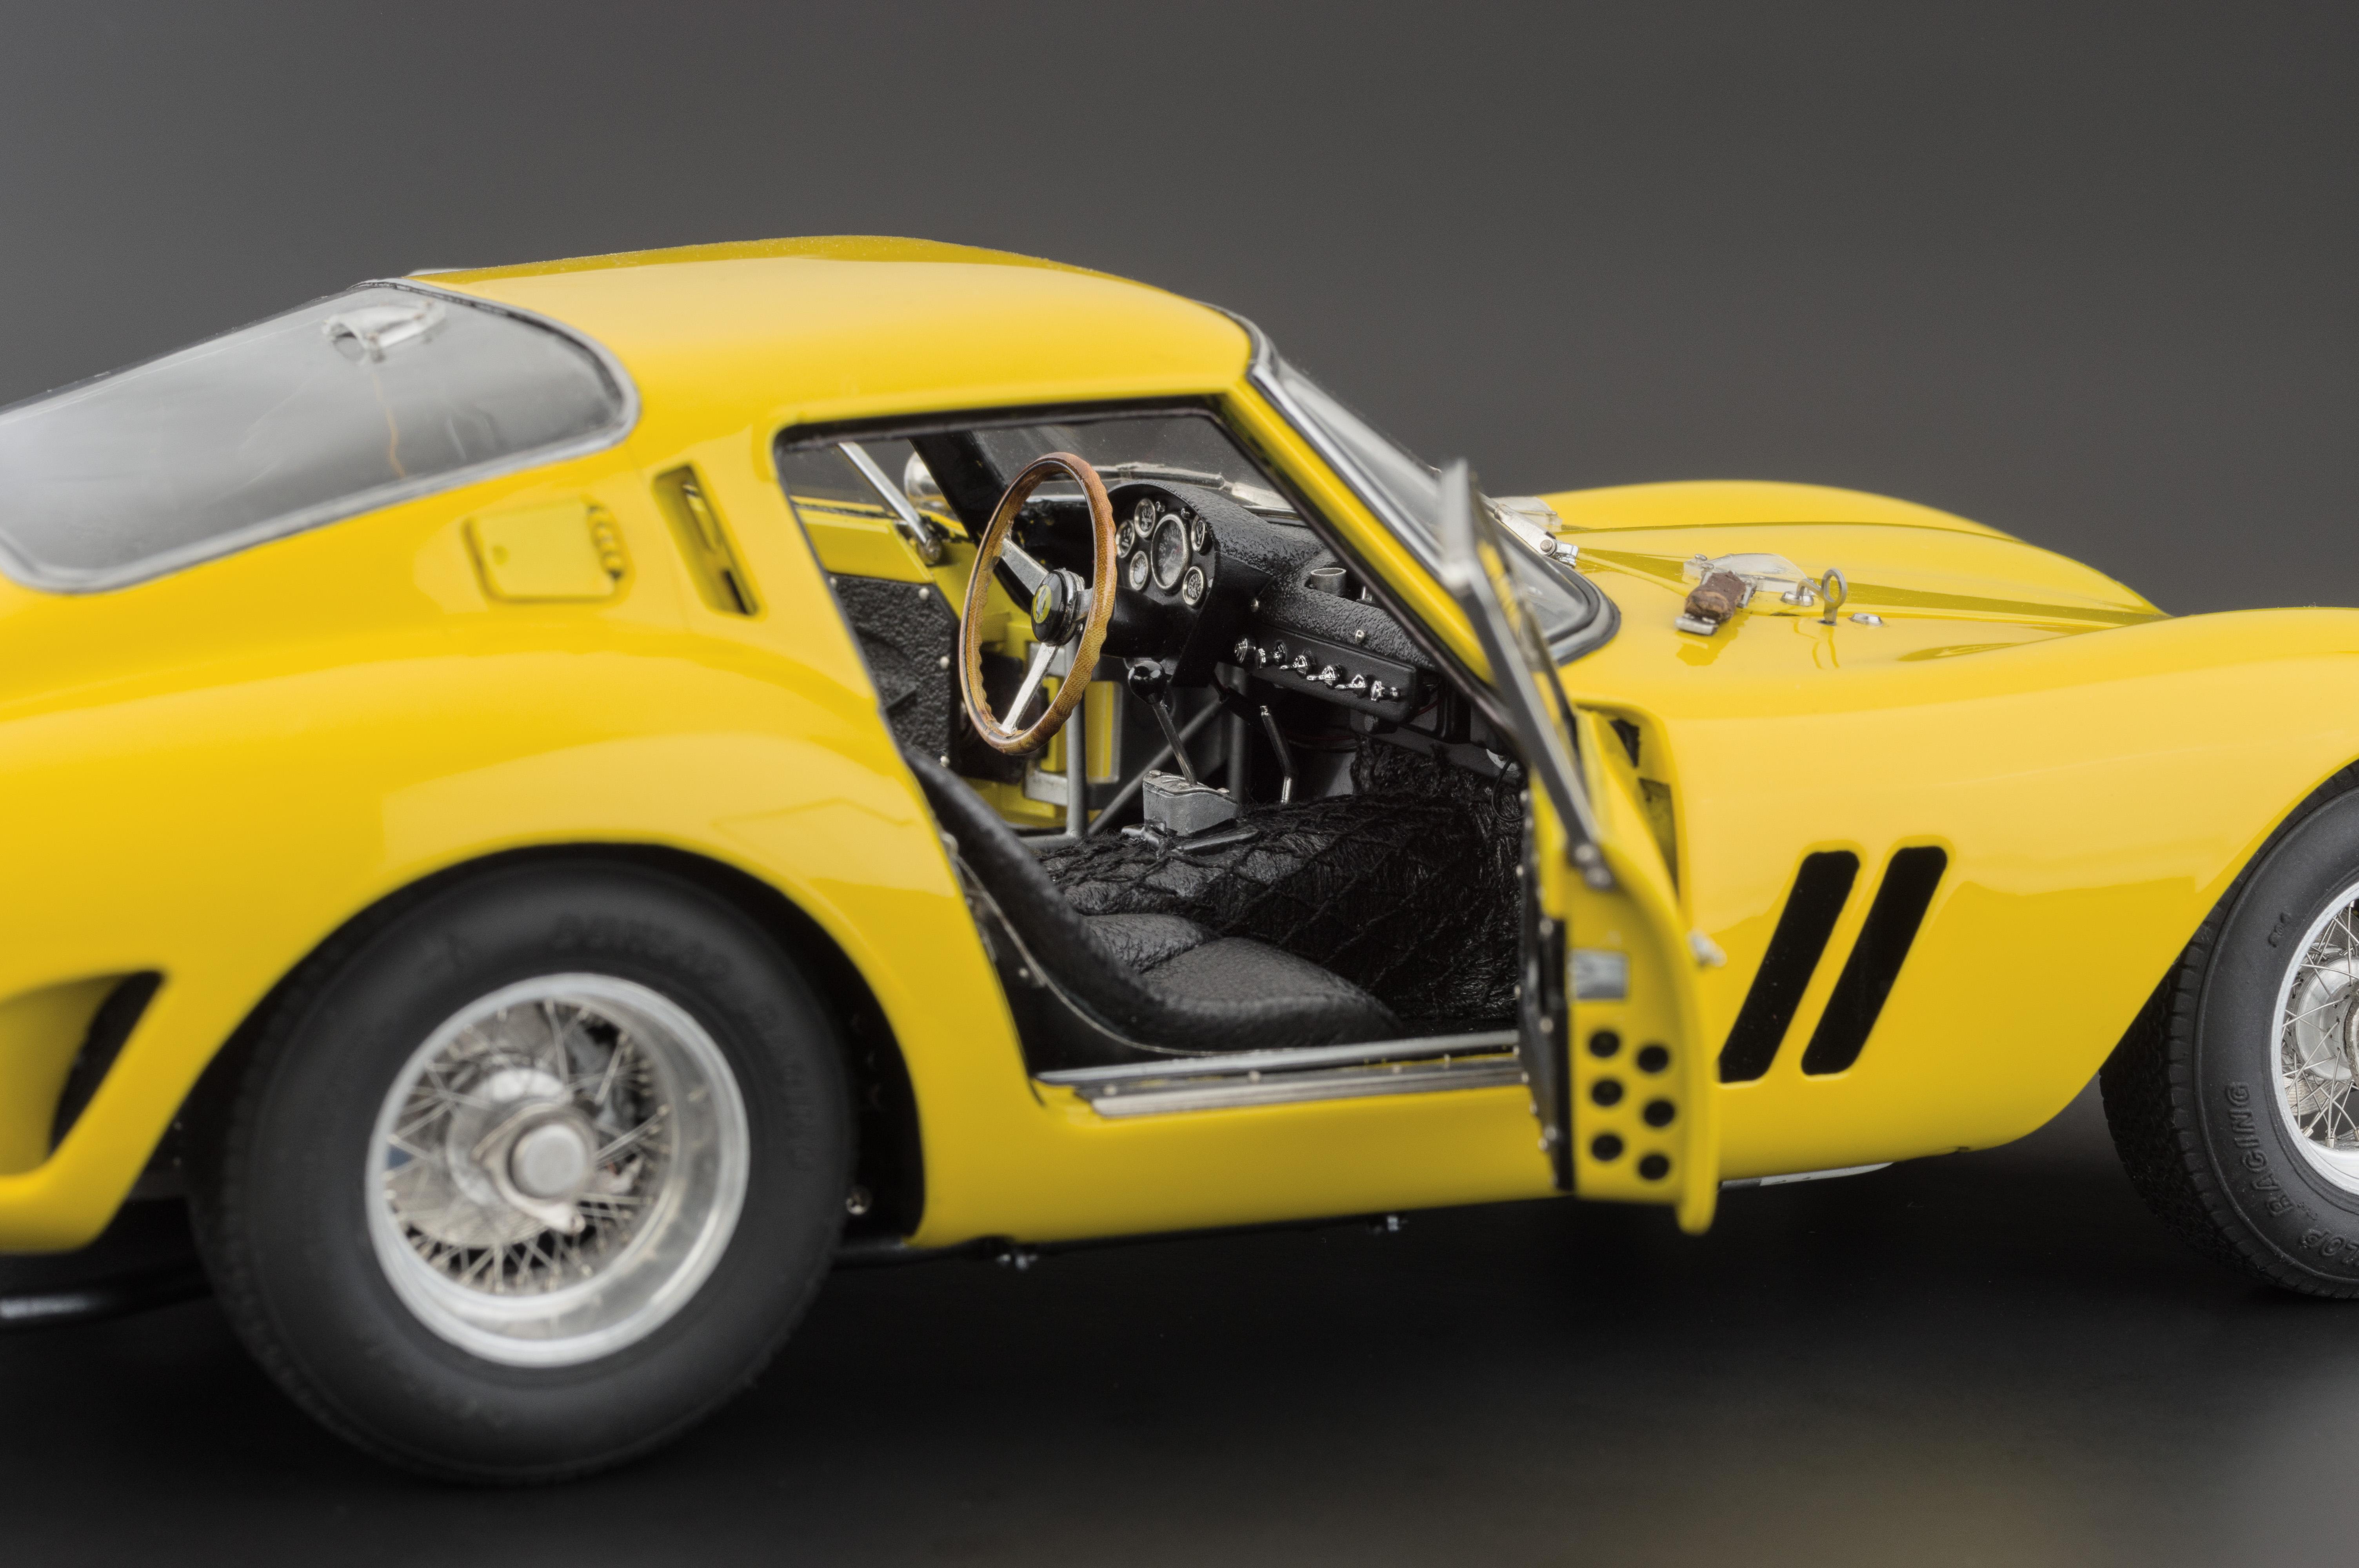 Yellow USA M-153 1:18 Scale CMC-Classic Model Cars Ferrari 250 GTO 1962 Limited Edition Vehicle